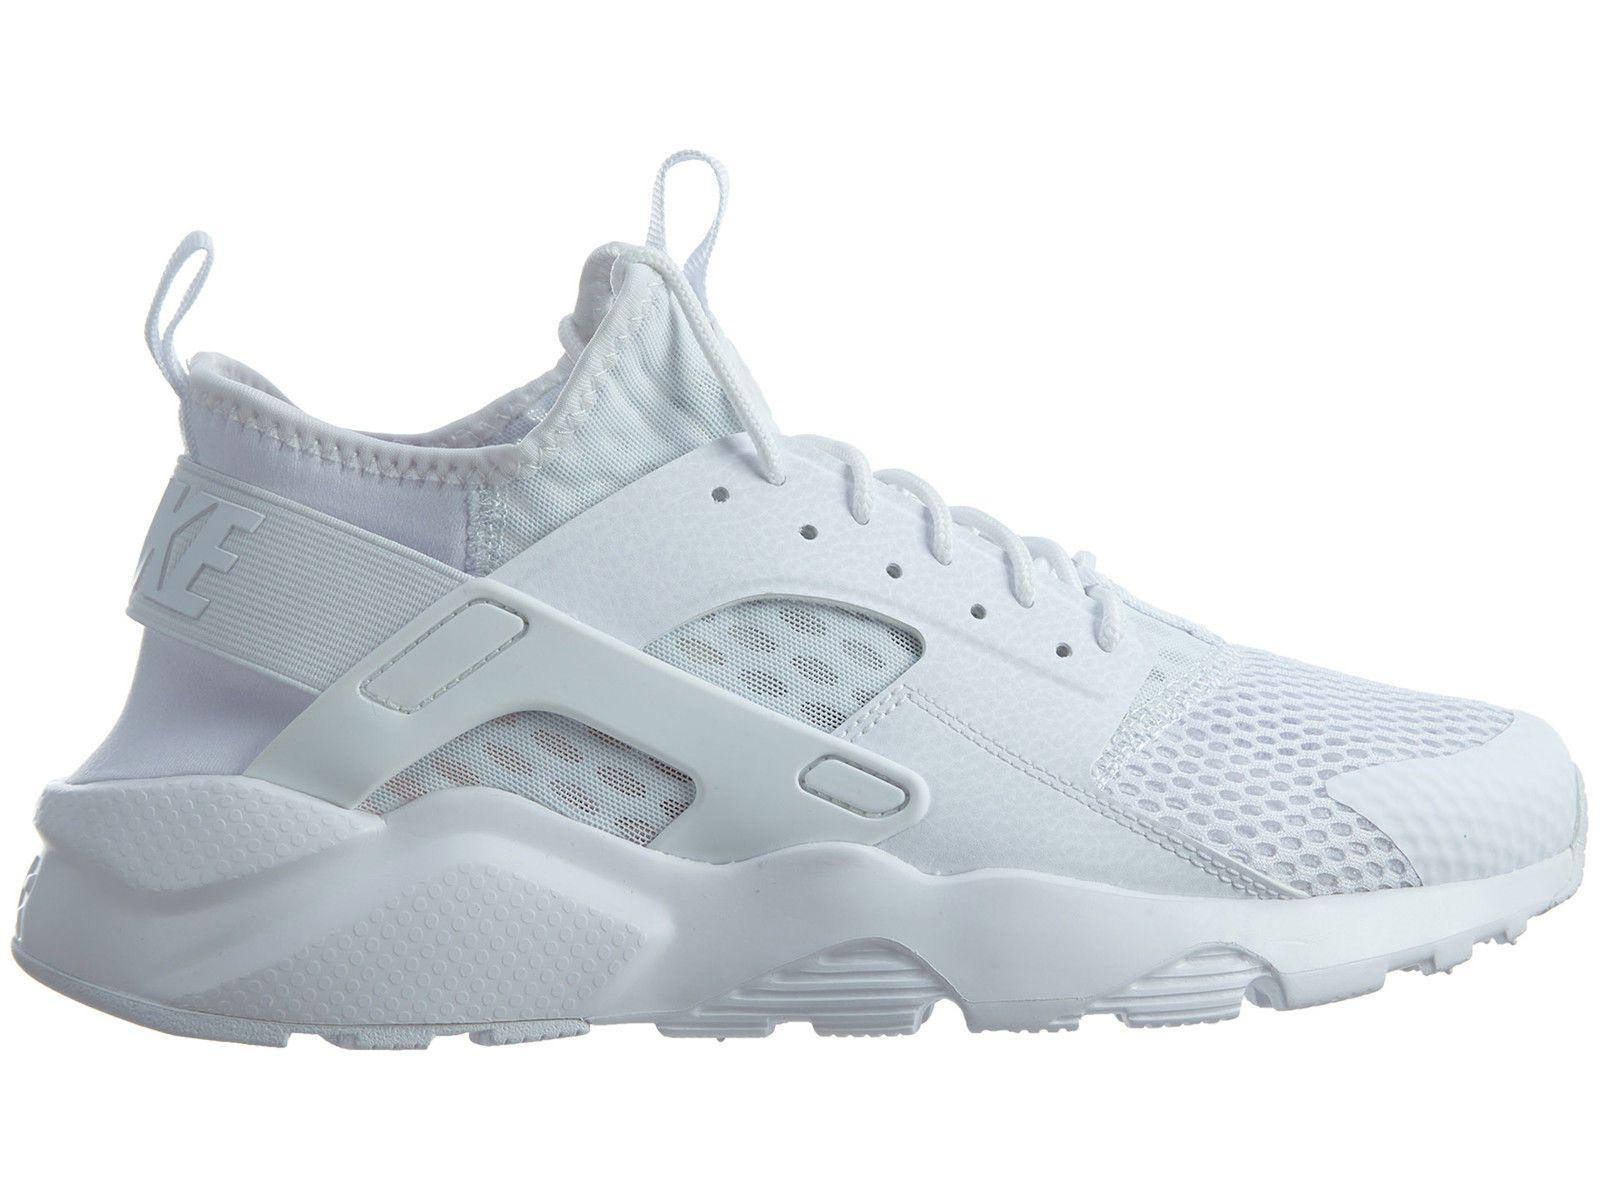 best service eae38 81e76 Nike Air Huarache Run Ultra BReathe Mens 833147-100 White Running Shoes Sz  10.5